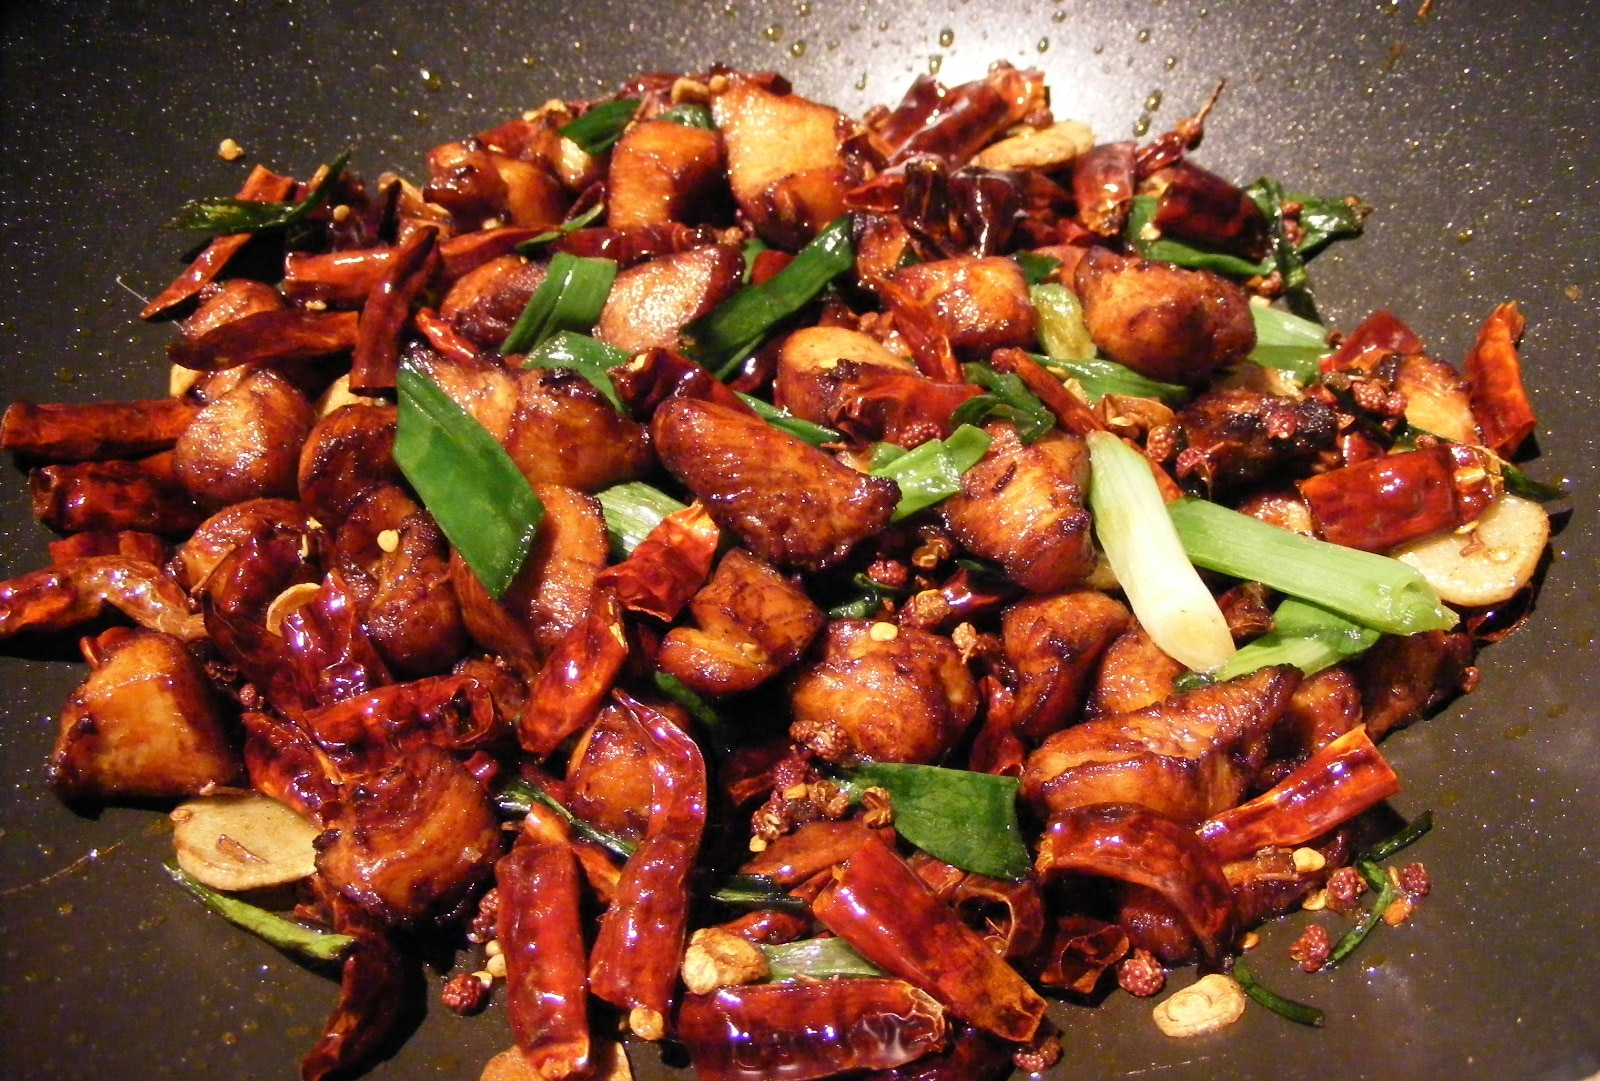 stir fry wok, stir fry wok recipe